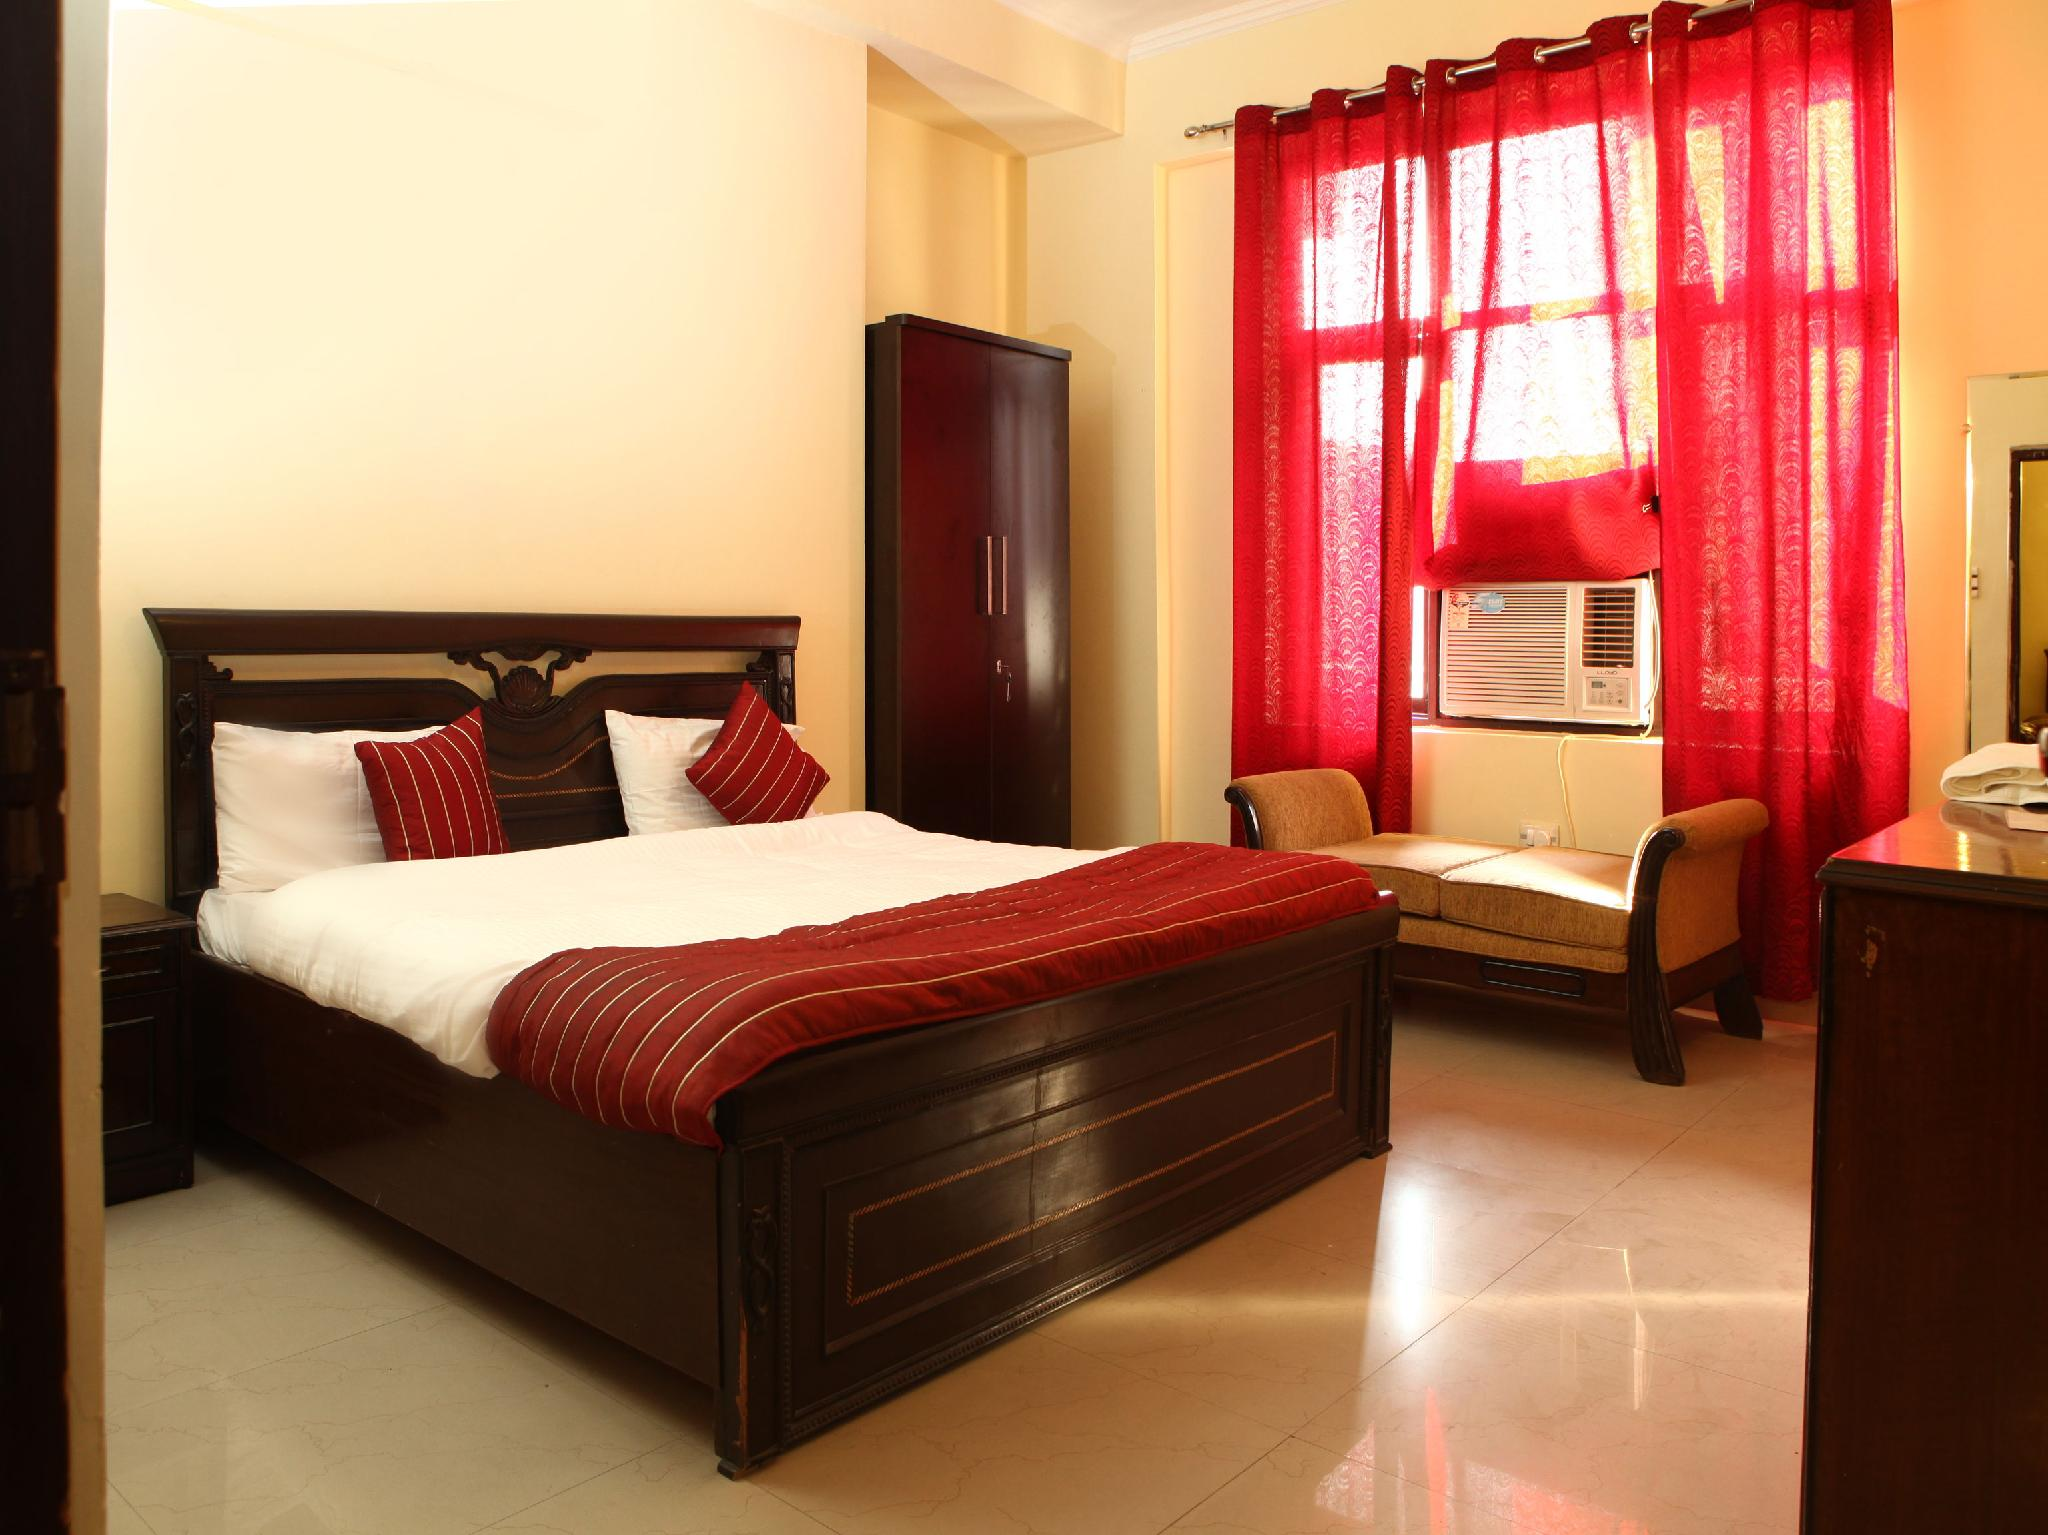 OYO Rooms - Noida City Centre Hotel